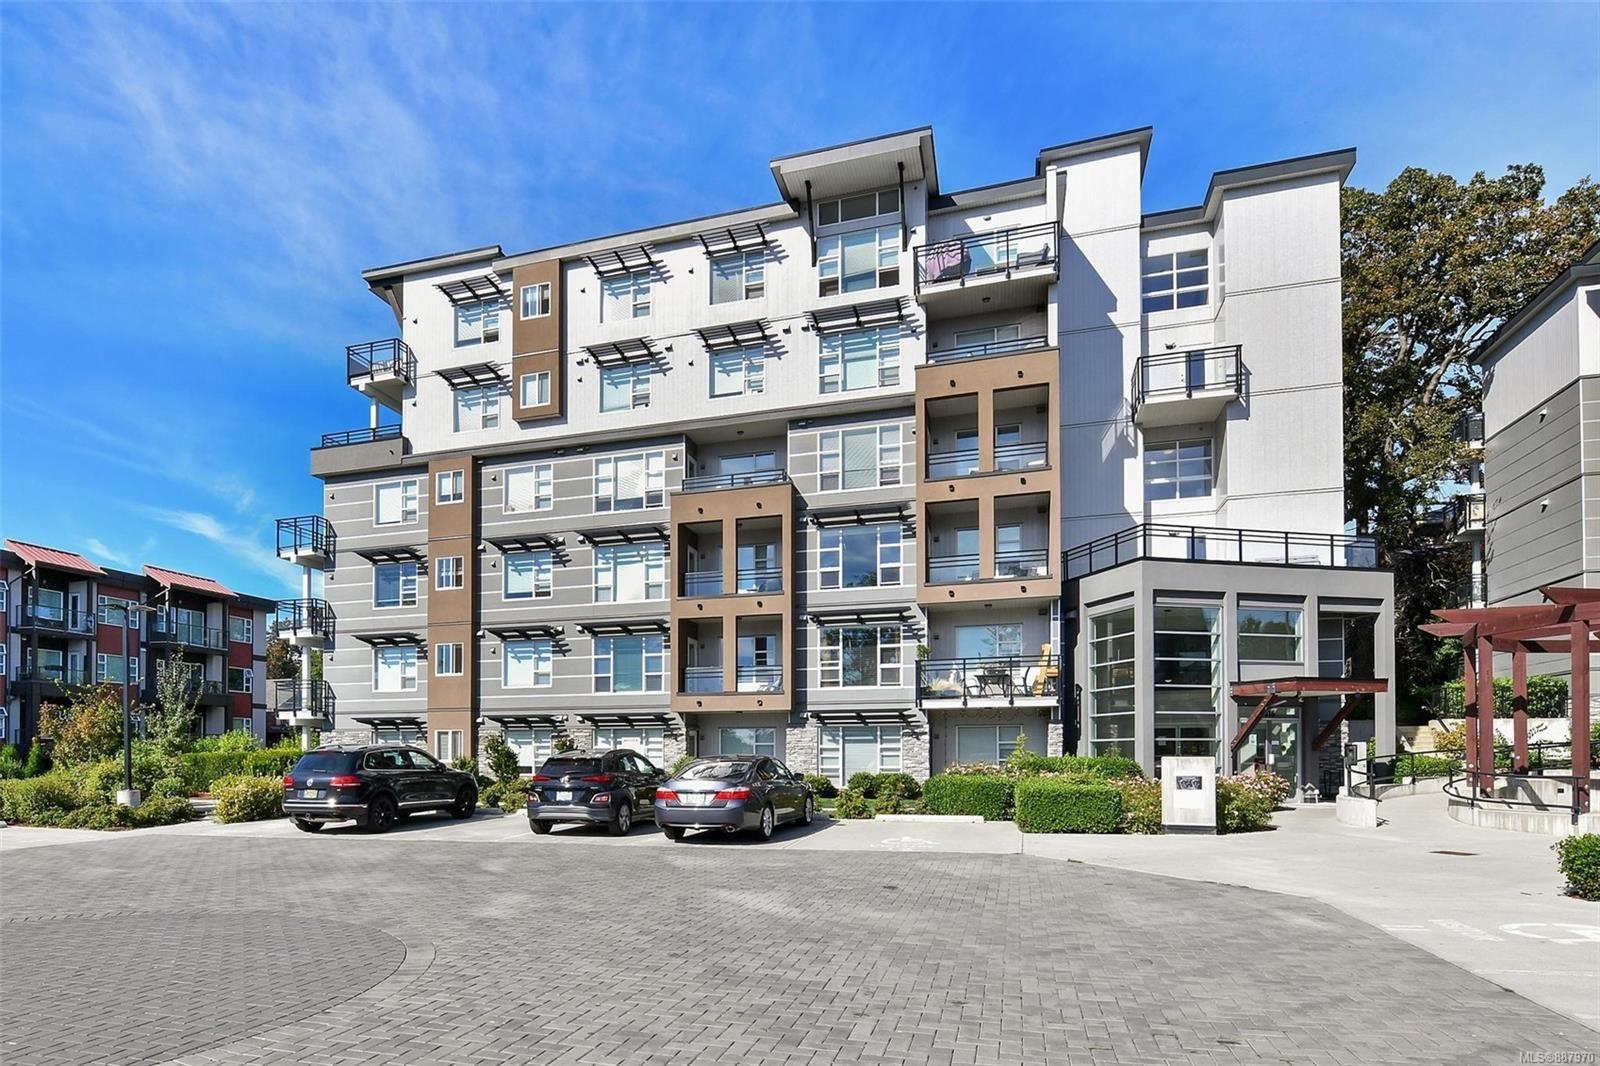 Main Photo: 305 1016 Inverness Rd in Saanich: SE Quadra Condo for sale (Saanich East)  : MLS®# 887970